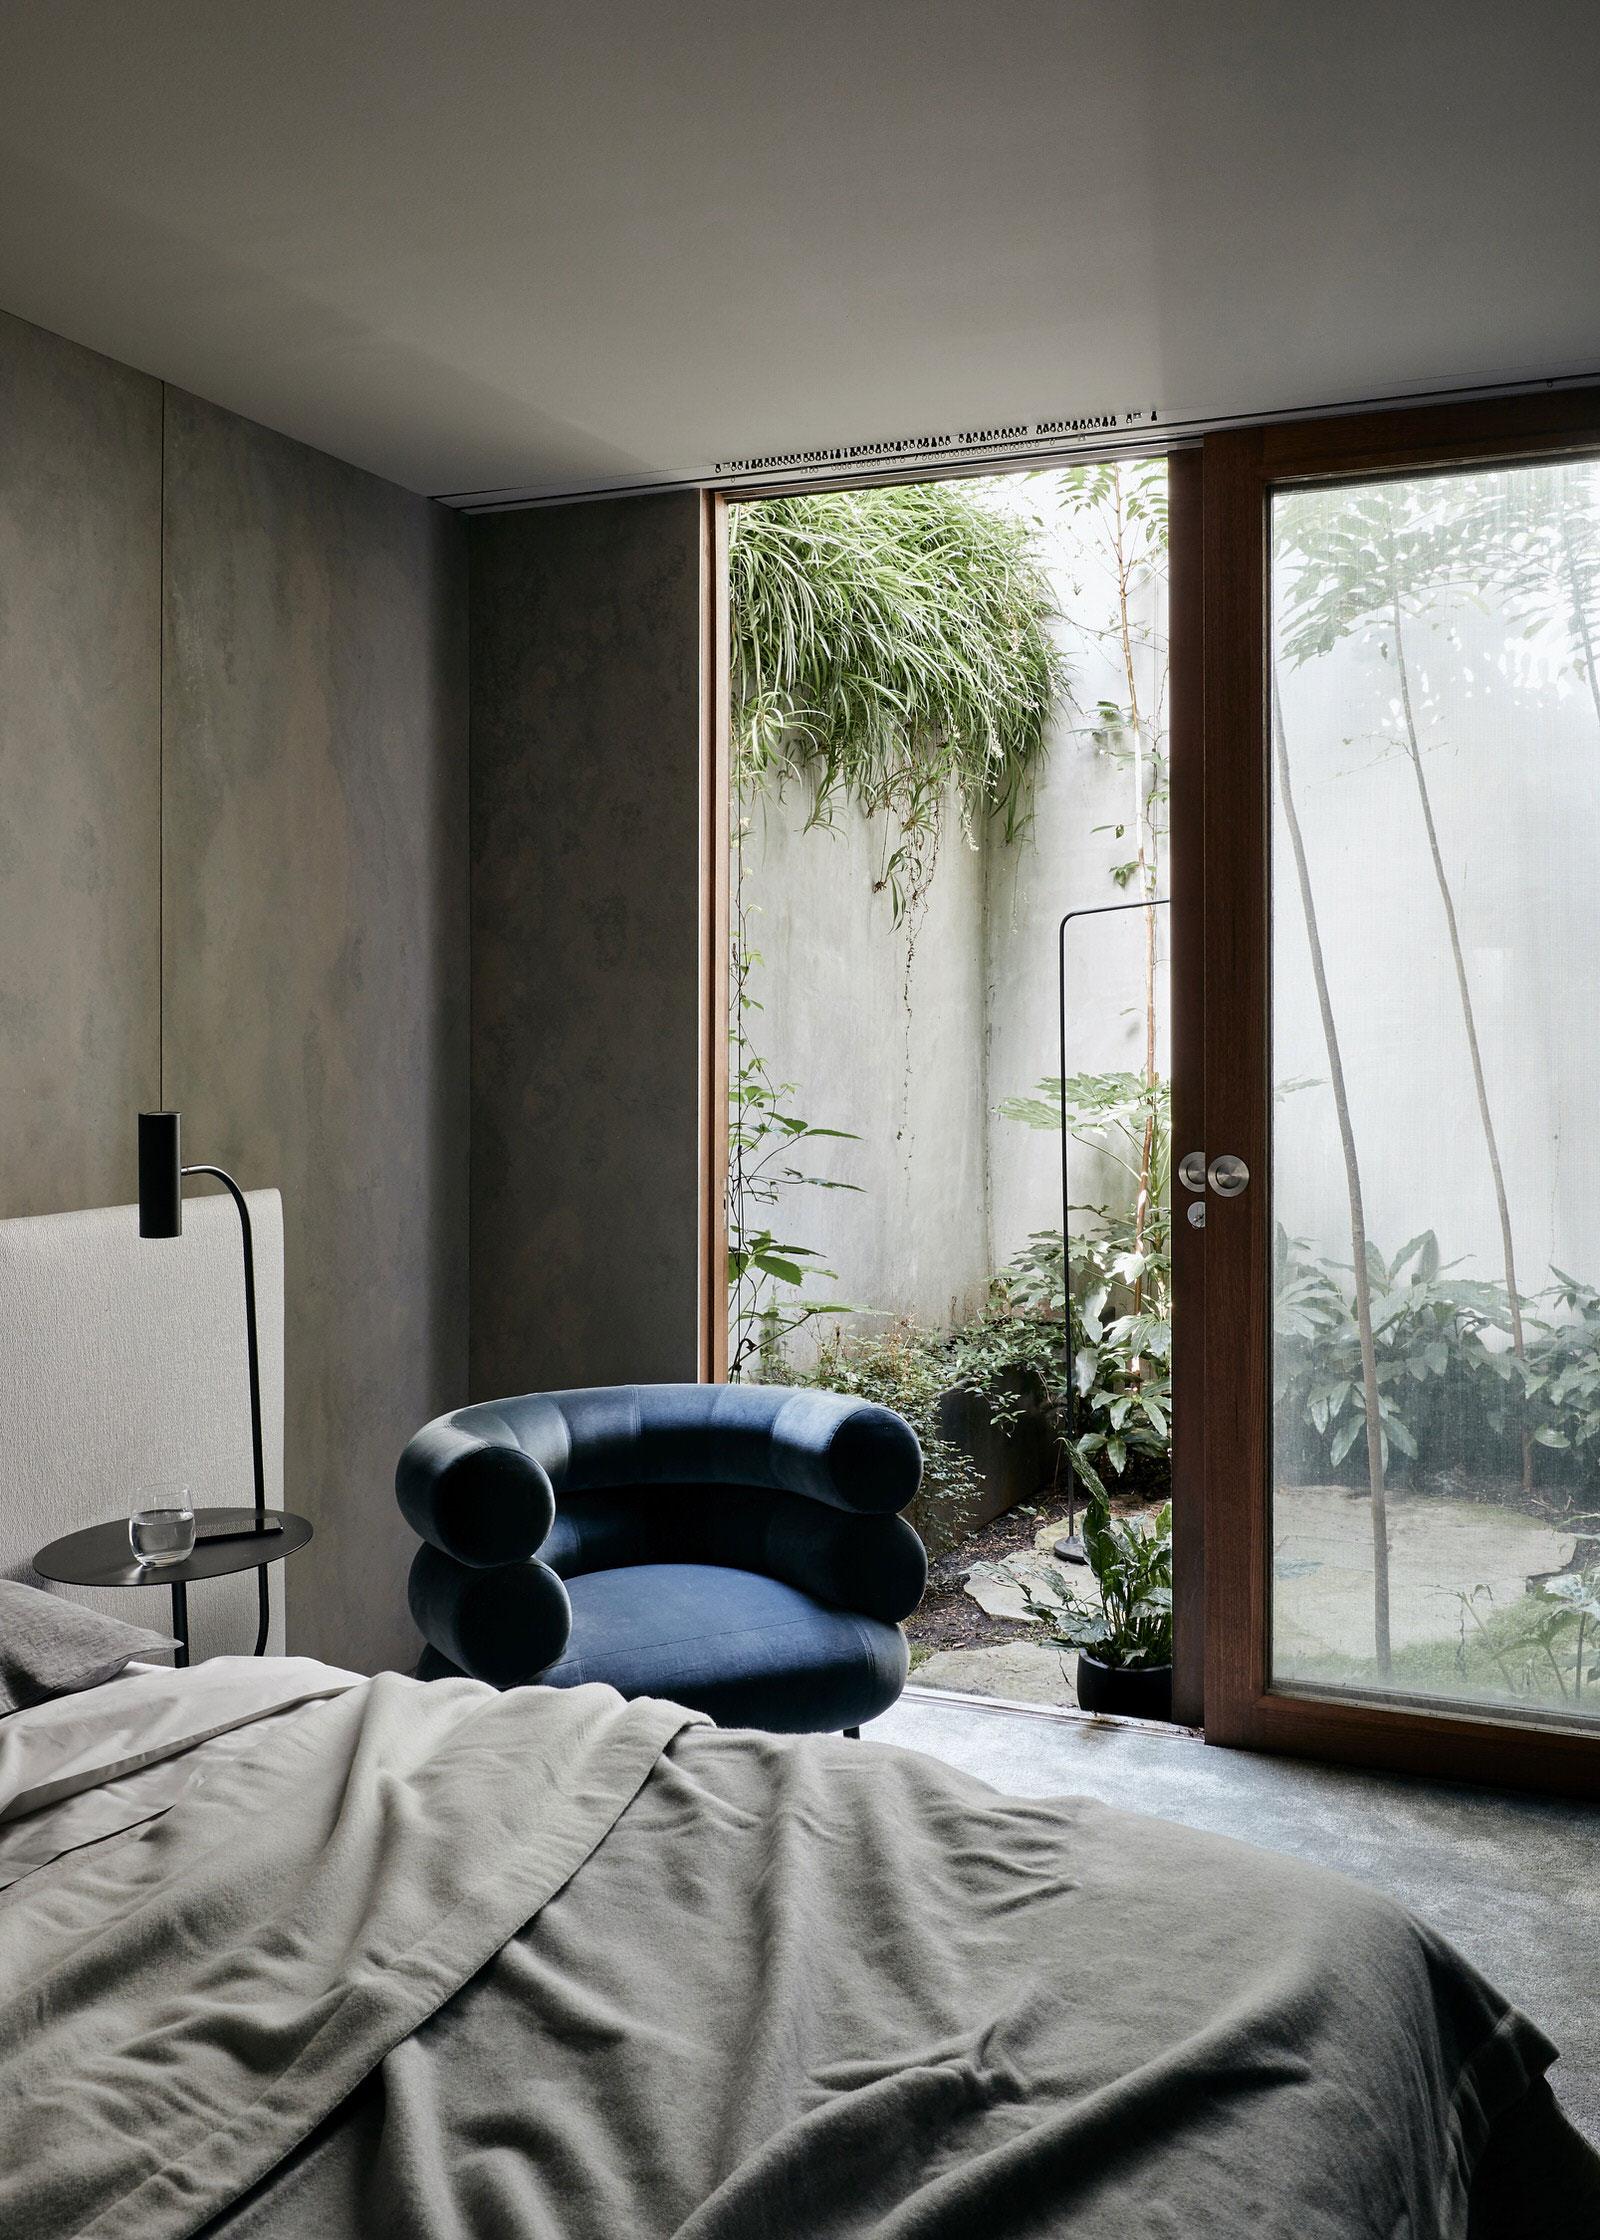 Fiona Lynch Burnley House Australian Interior Design Photo Amelia Stanwix Yellowtrace 16